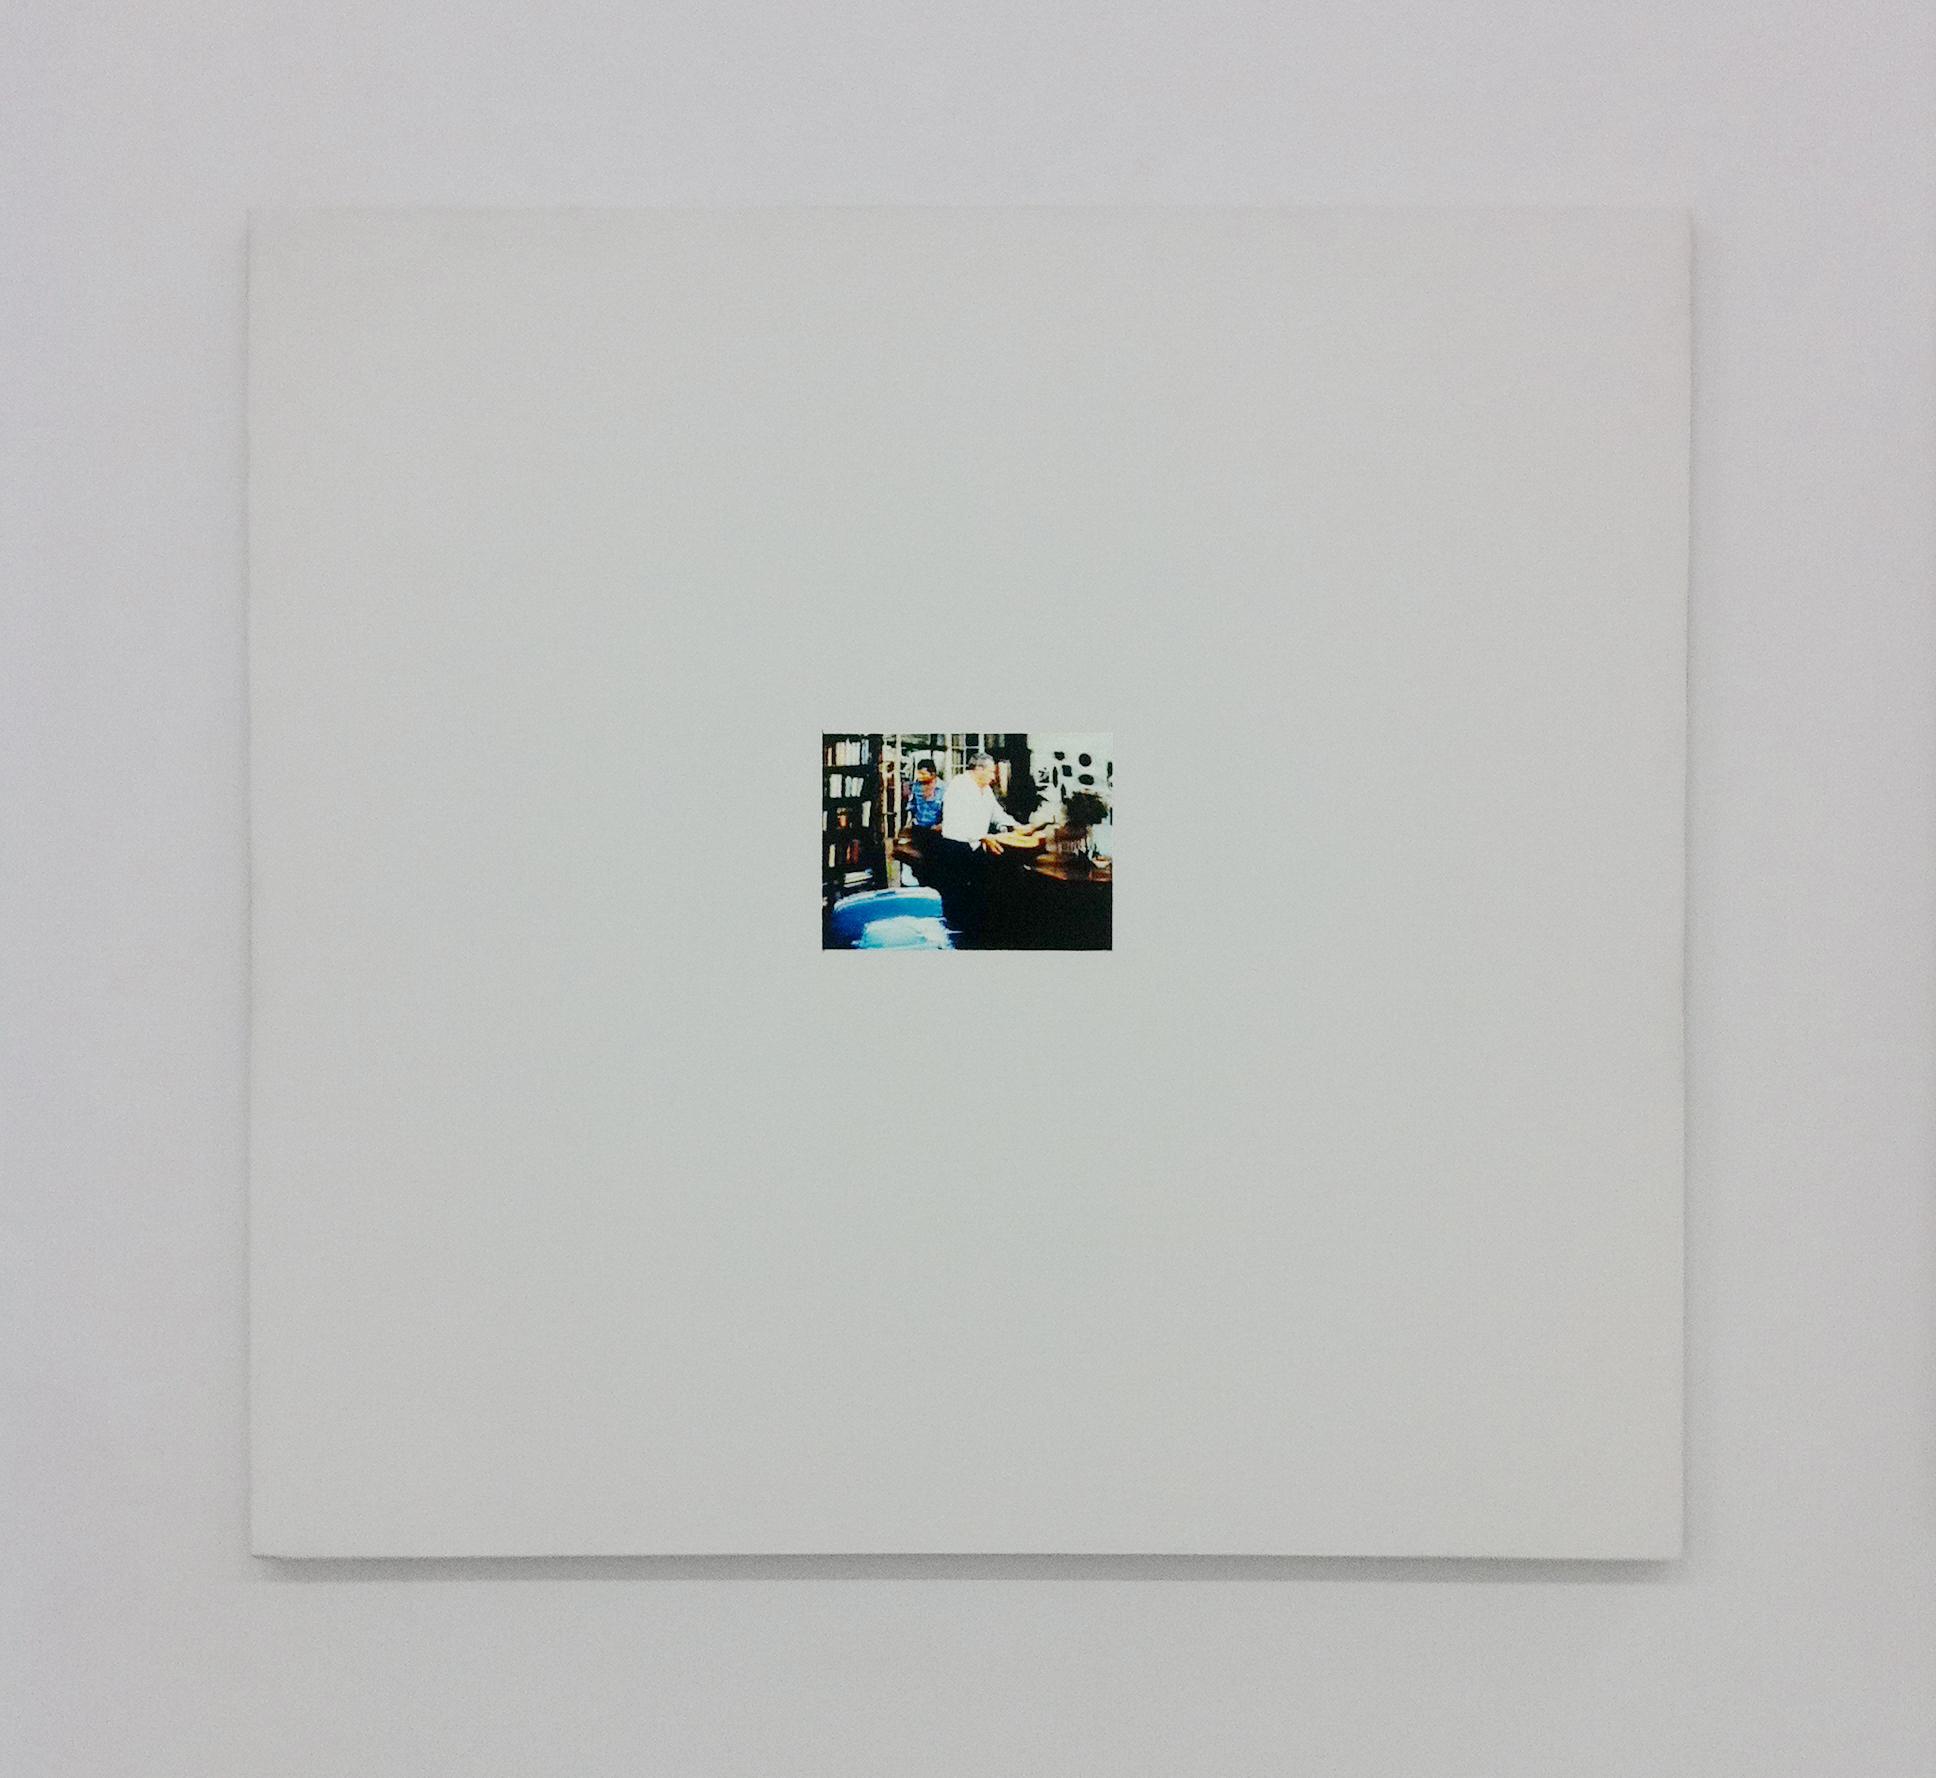 Untitled , 2003, oil and gesso on plexiglas, 83,8 x 78,7 cm